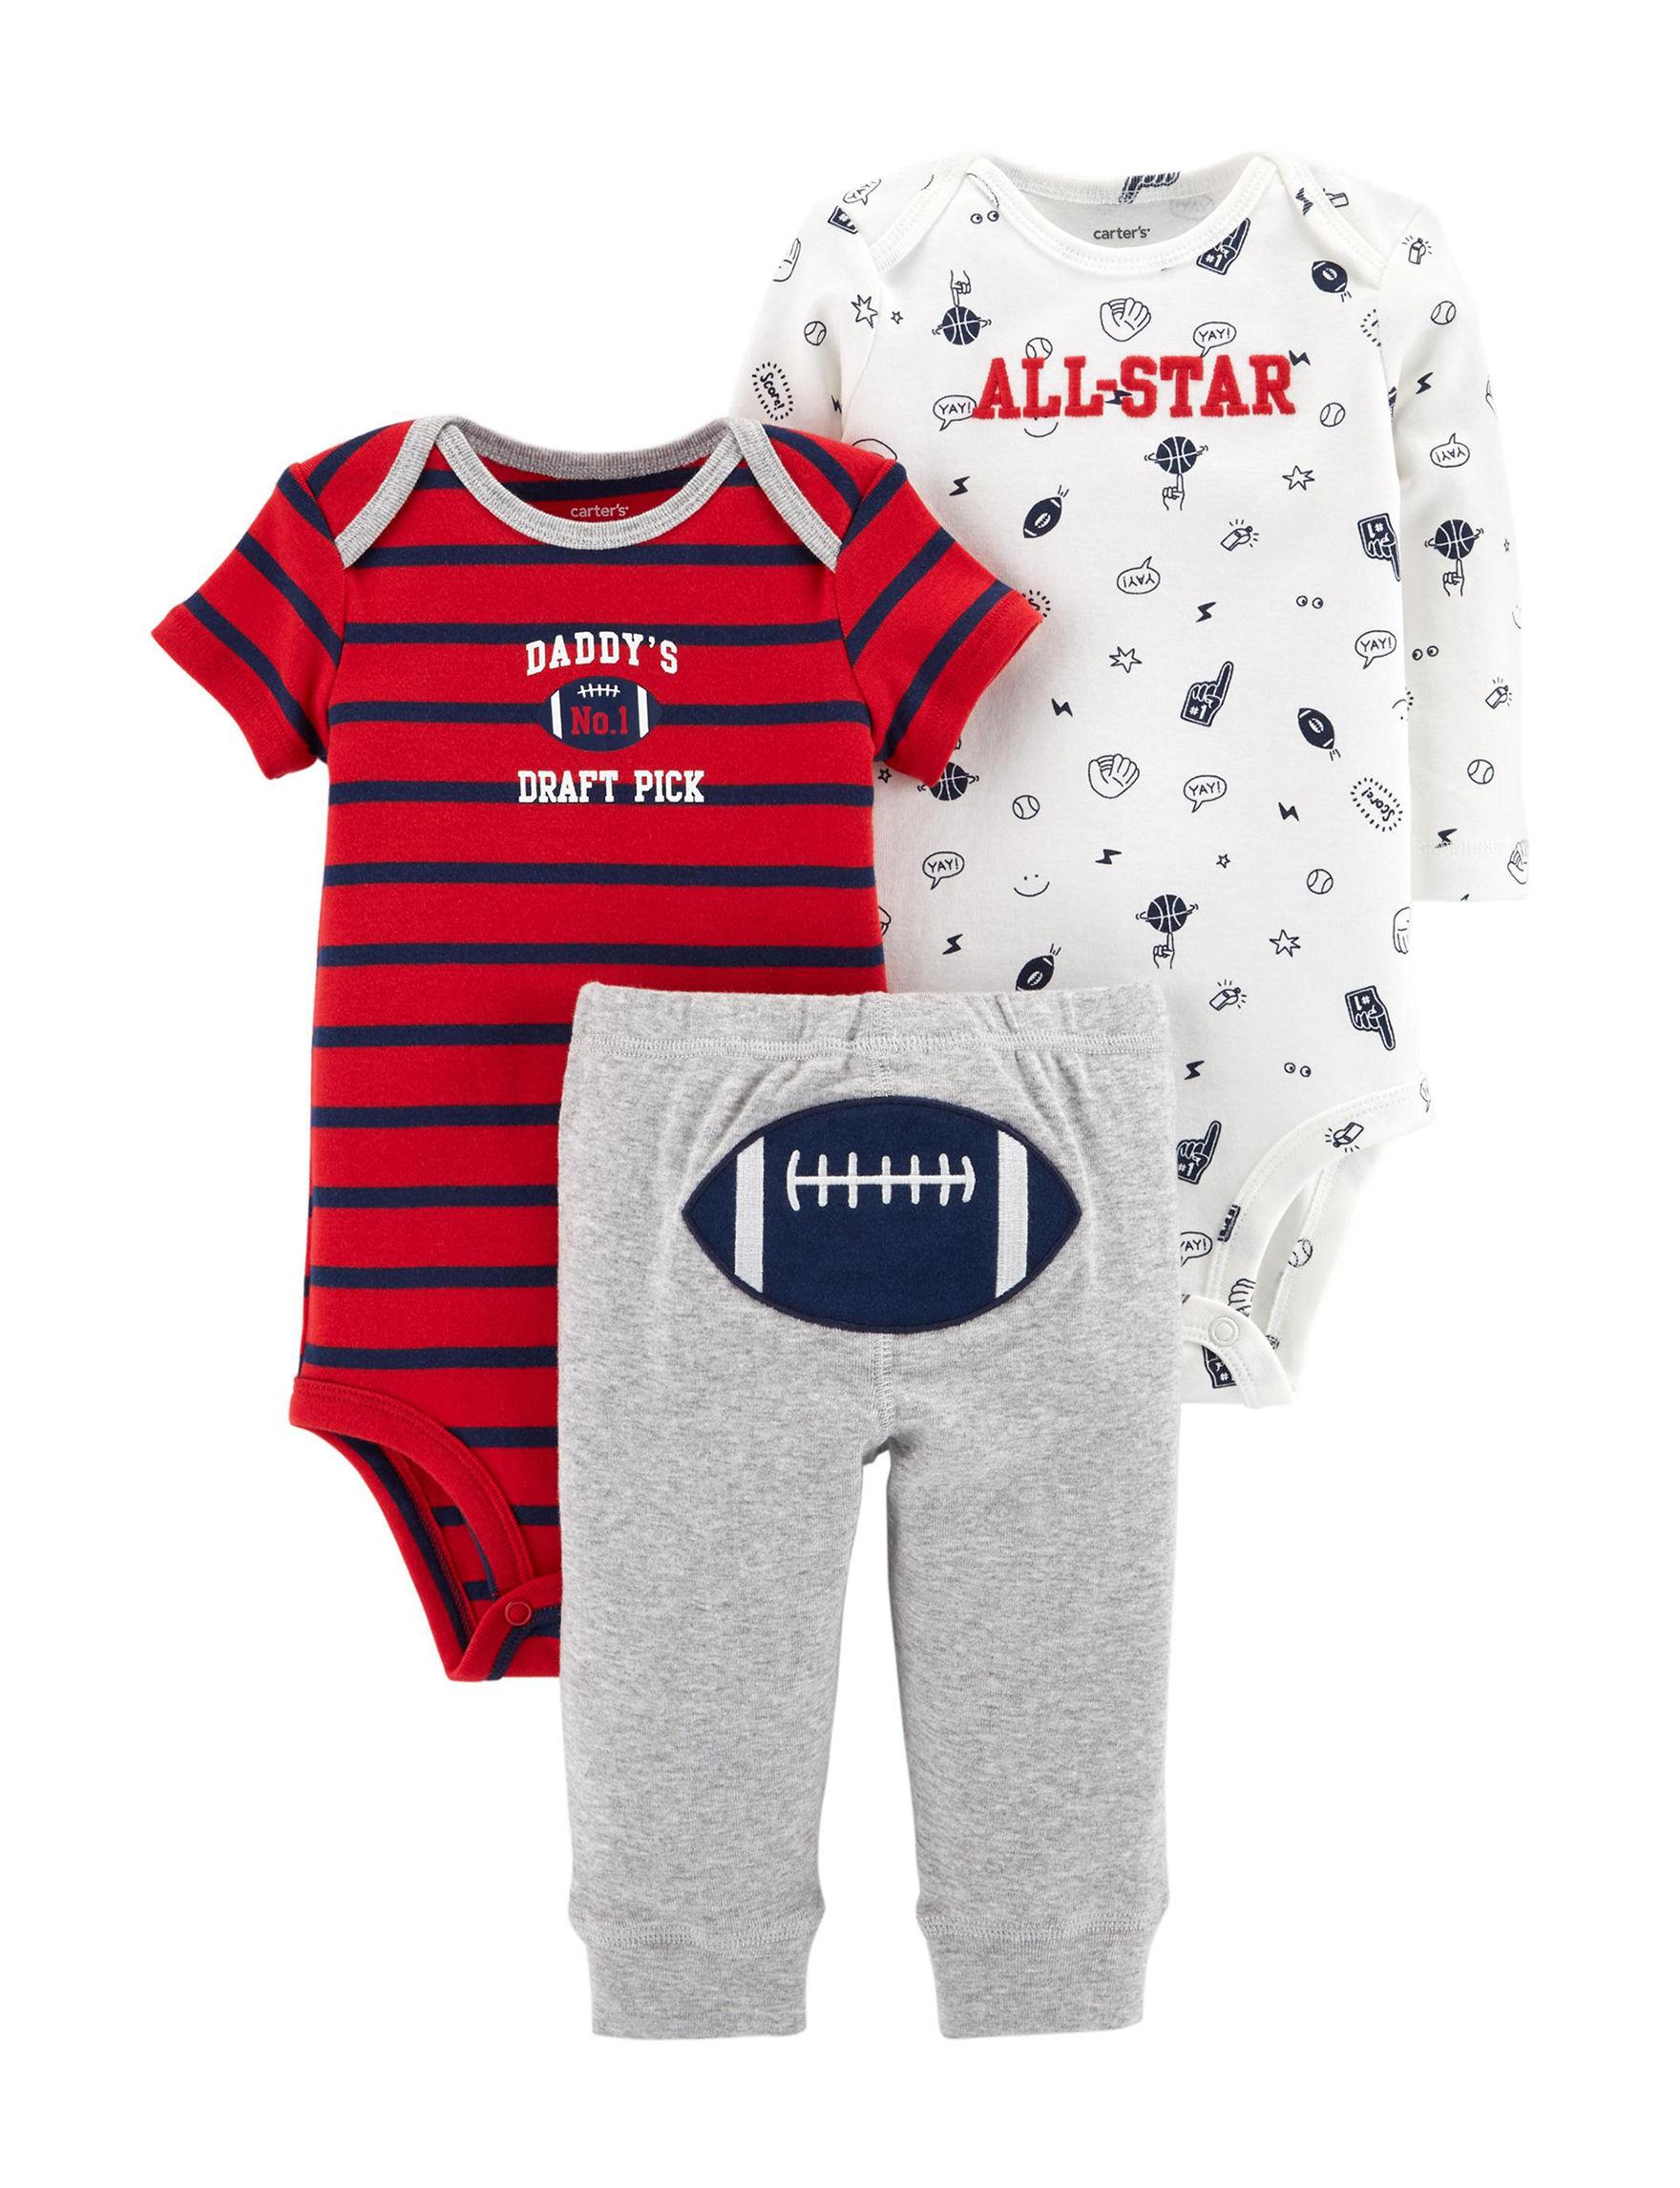 9b782438b UPC 889338674233 product image for Carter's 3-pc. Football Turn Me Set -  Baby ...